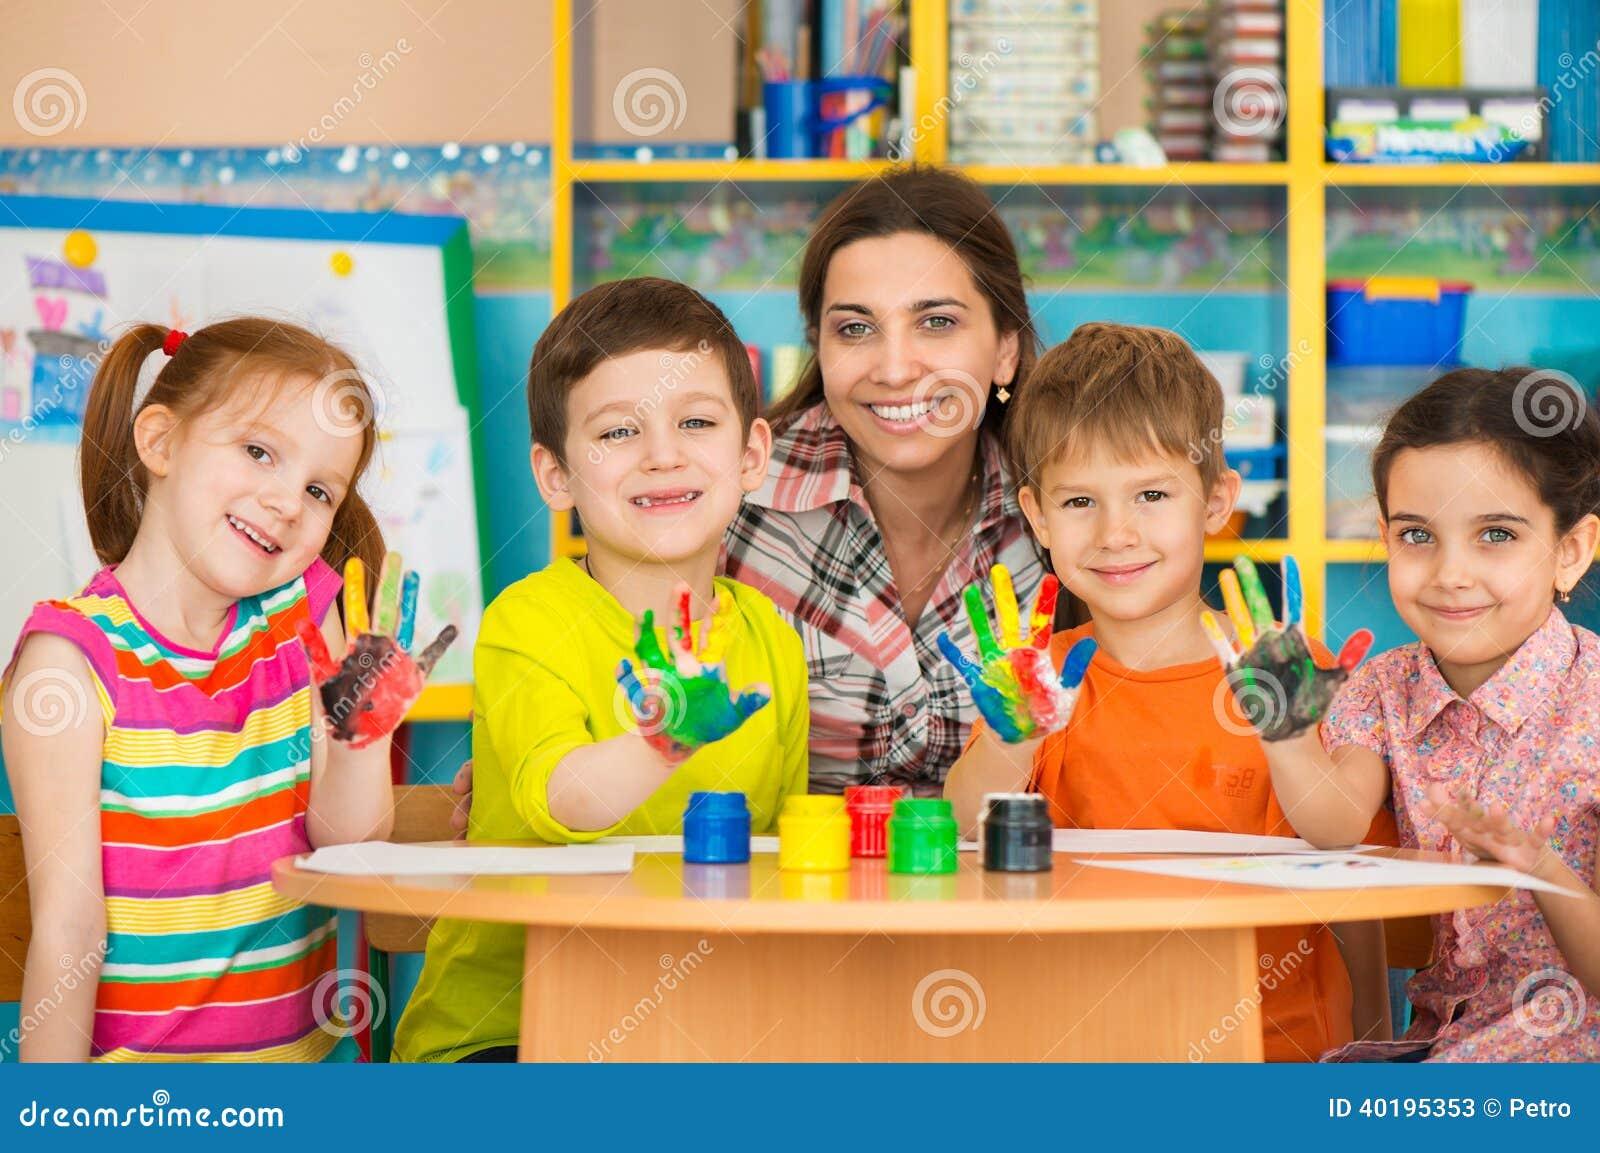 Ages & Stages – Preschool Children